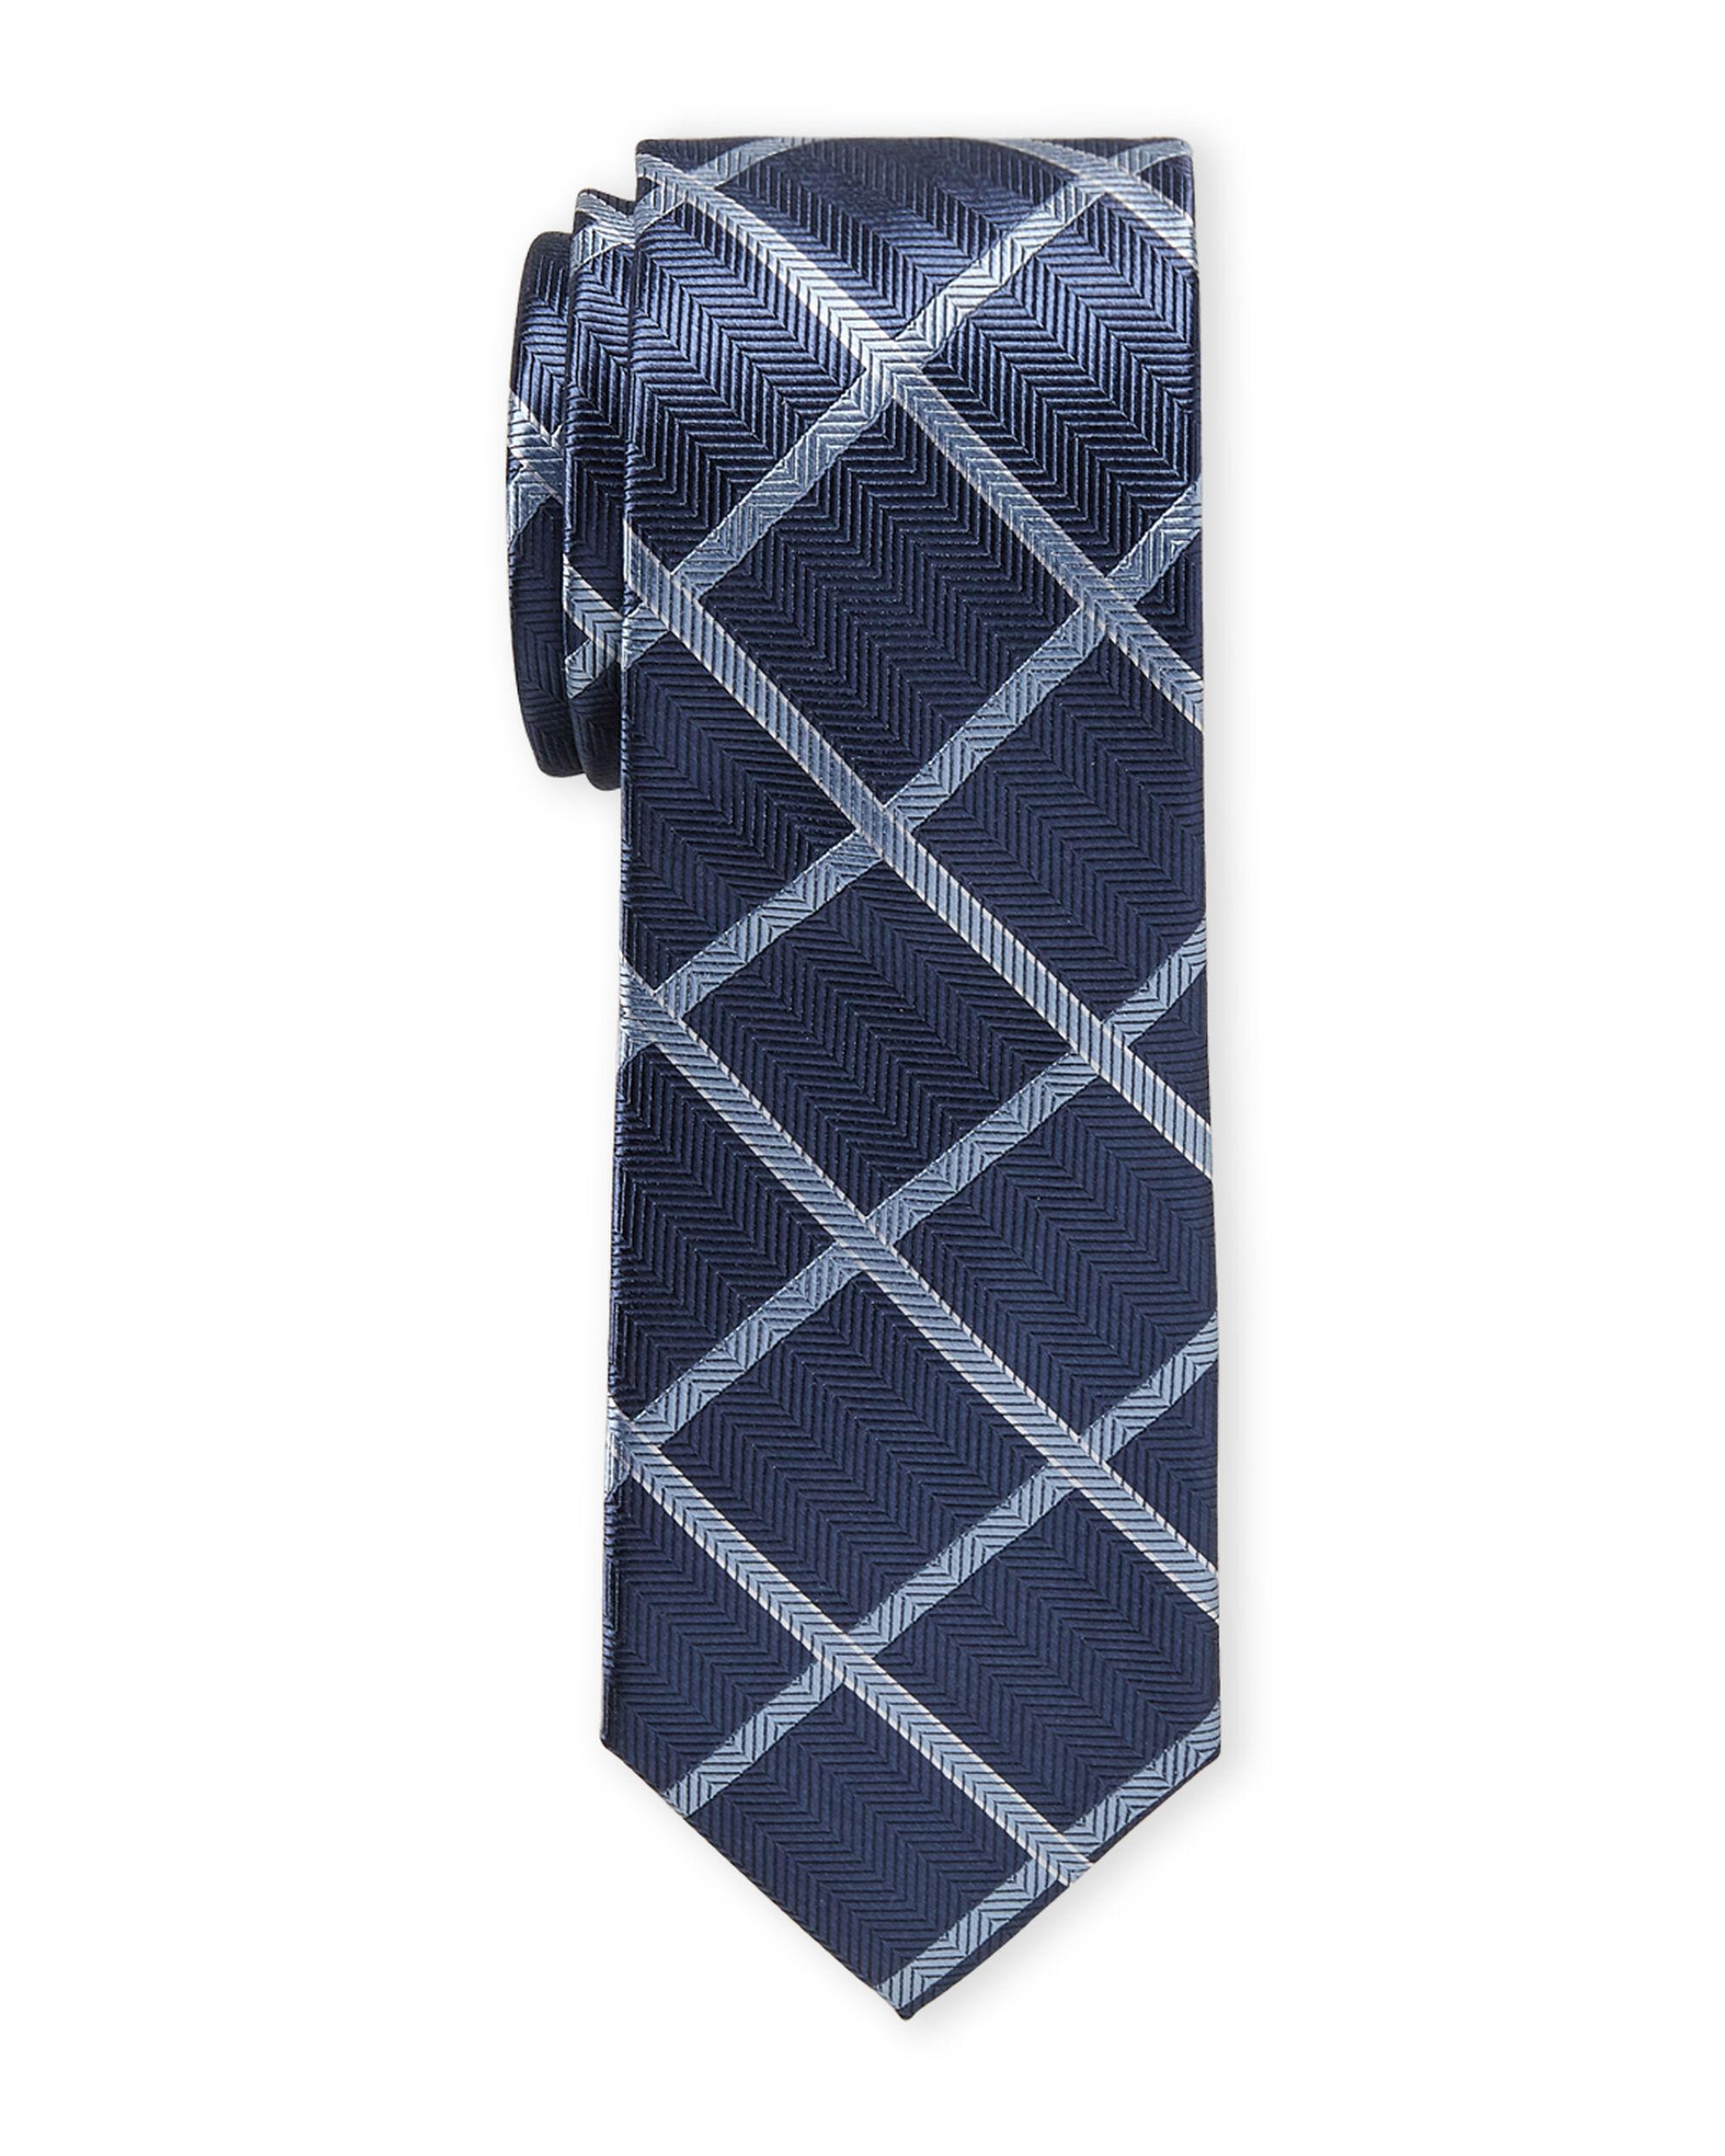 8c66b332384d MICHAEL Michael Kors Silk-blend Check Tie in Blue for Men - Lyst